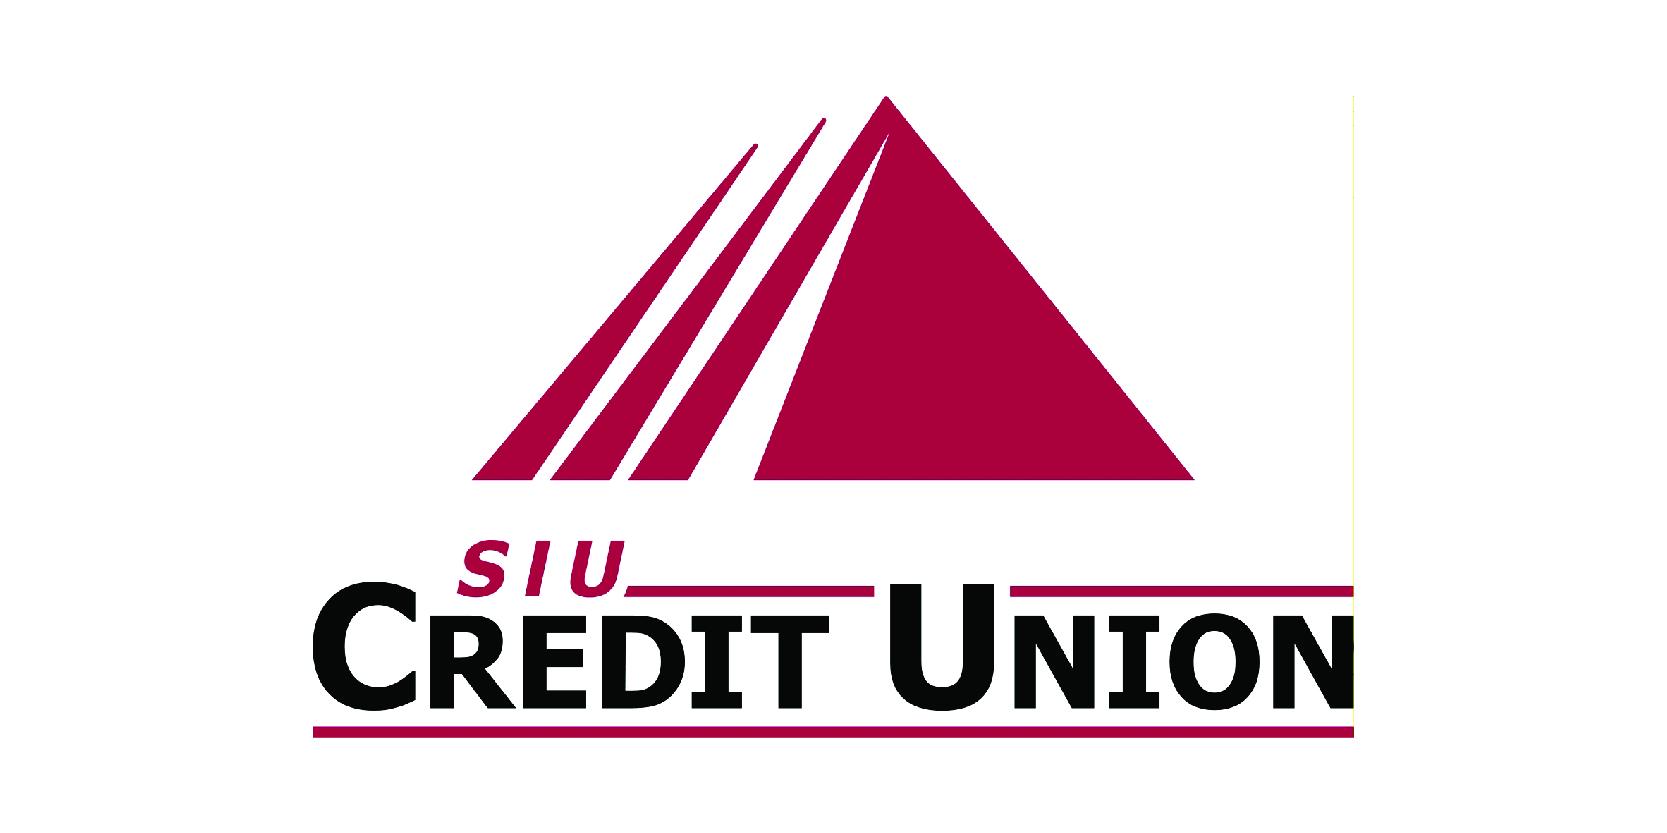 Leader_SIU Credit Union.jpg